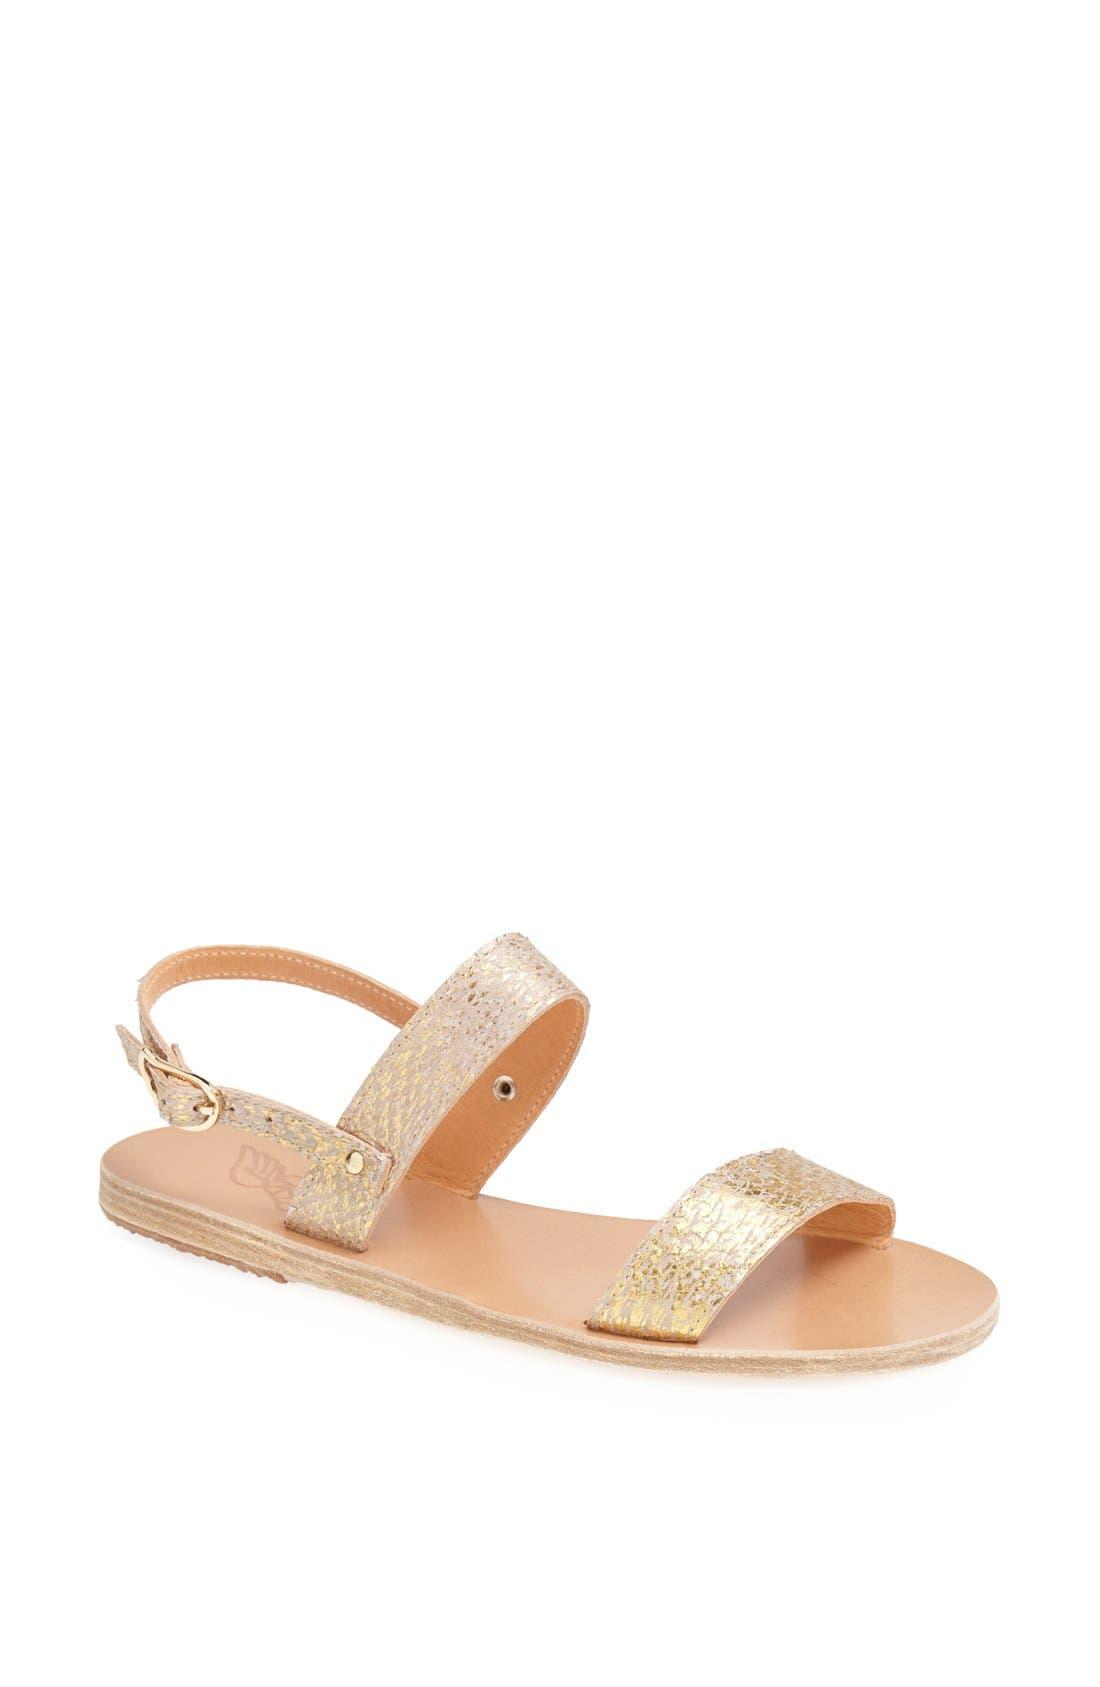 Main Image - Ancient Greek Sandals 'Clio' Metallic Salmon Skin Sandal